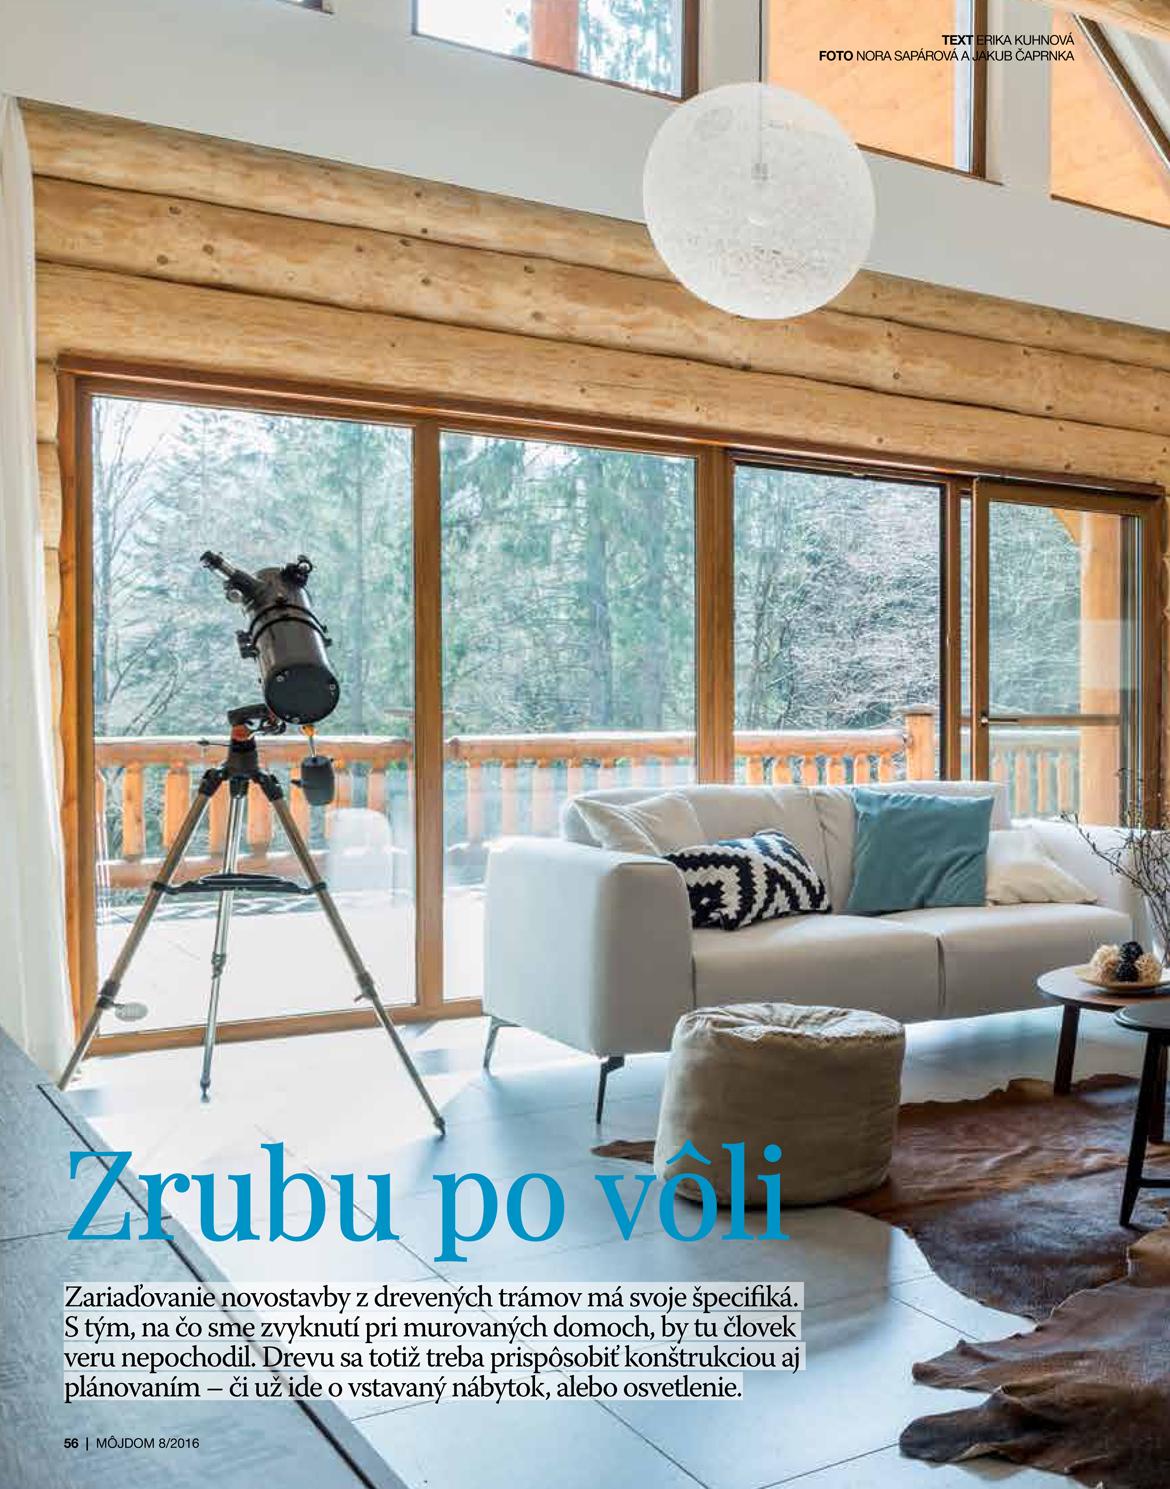 001-interier-zrub-tale-mojdom-pavlech-architekti